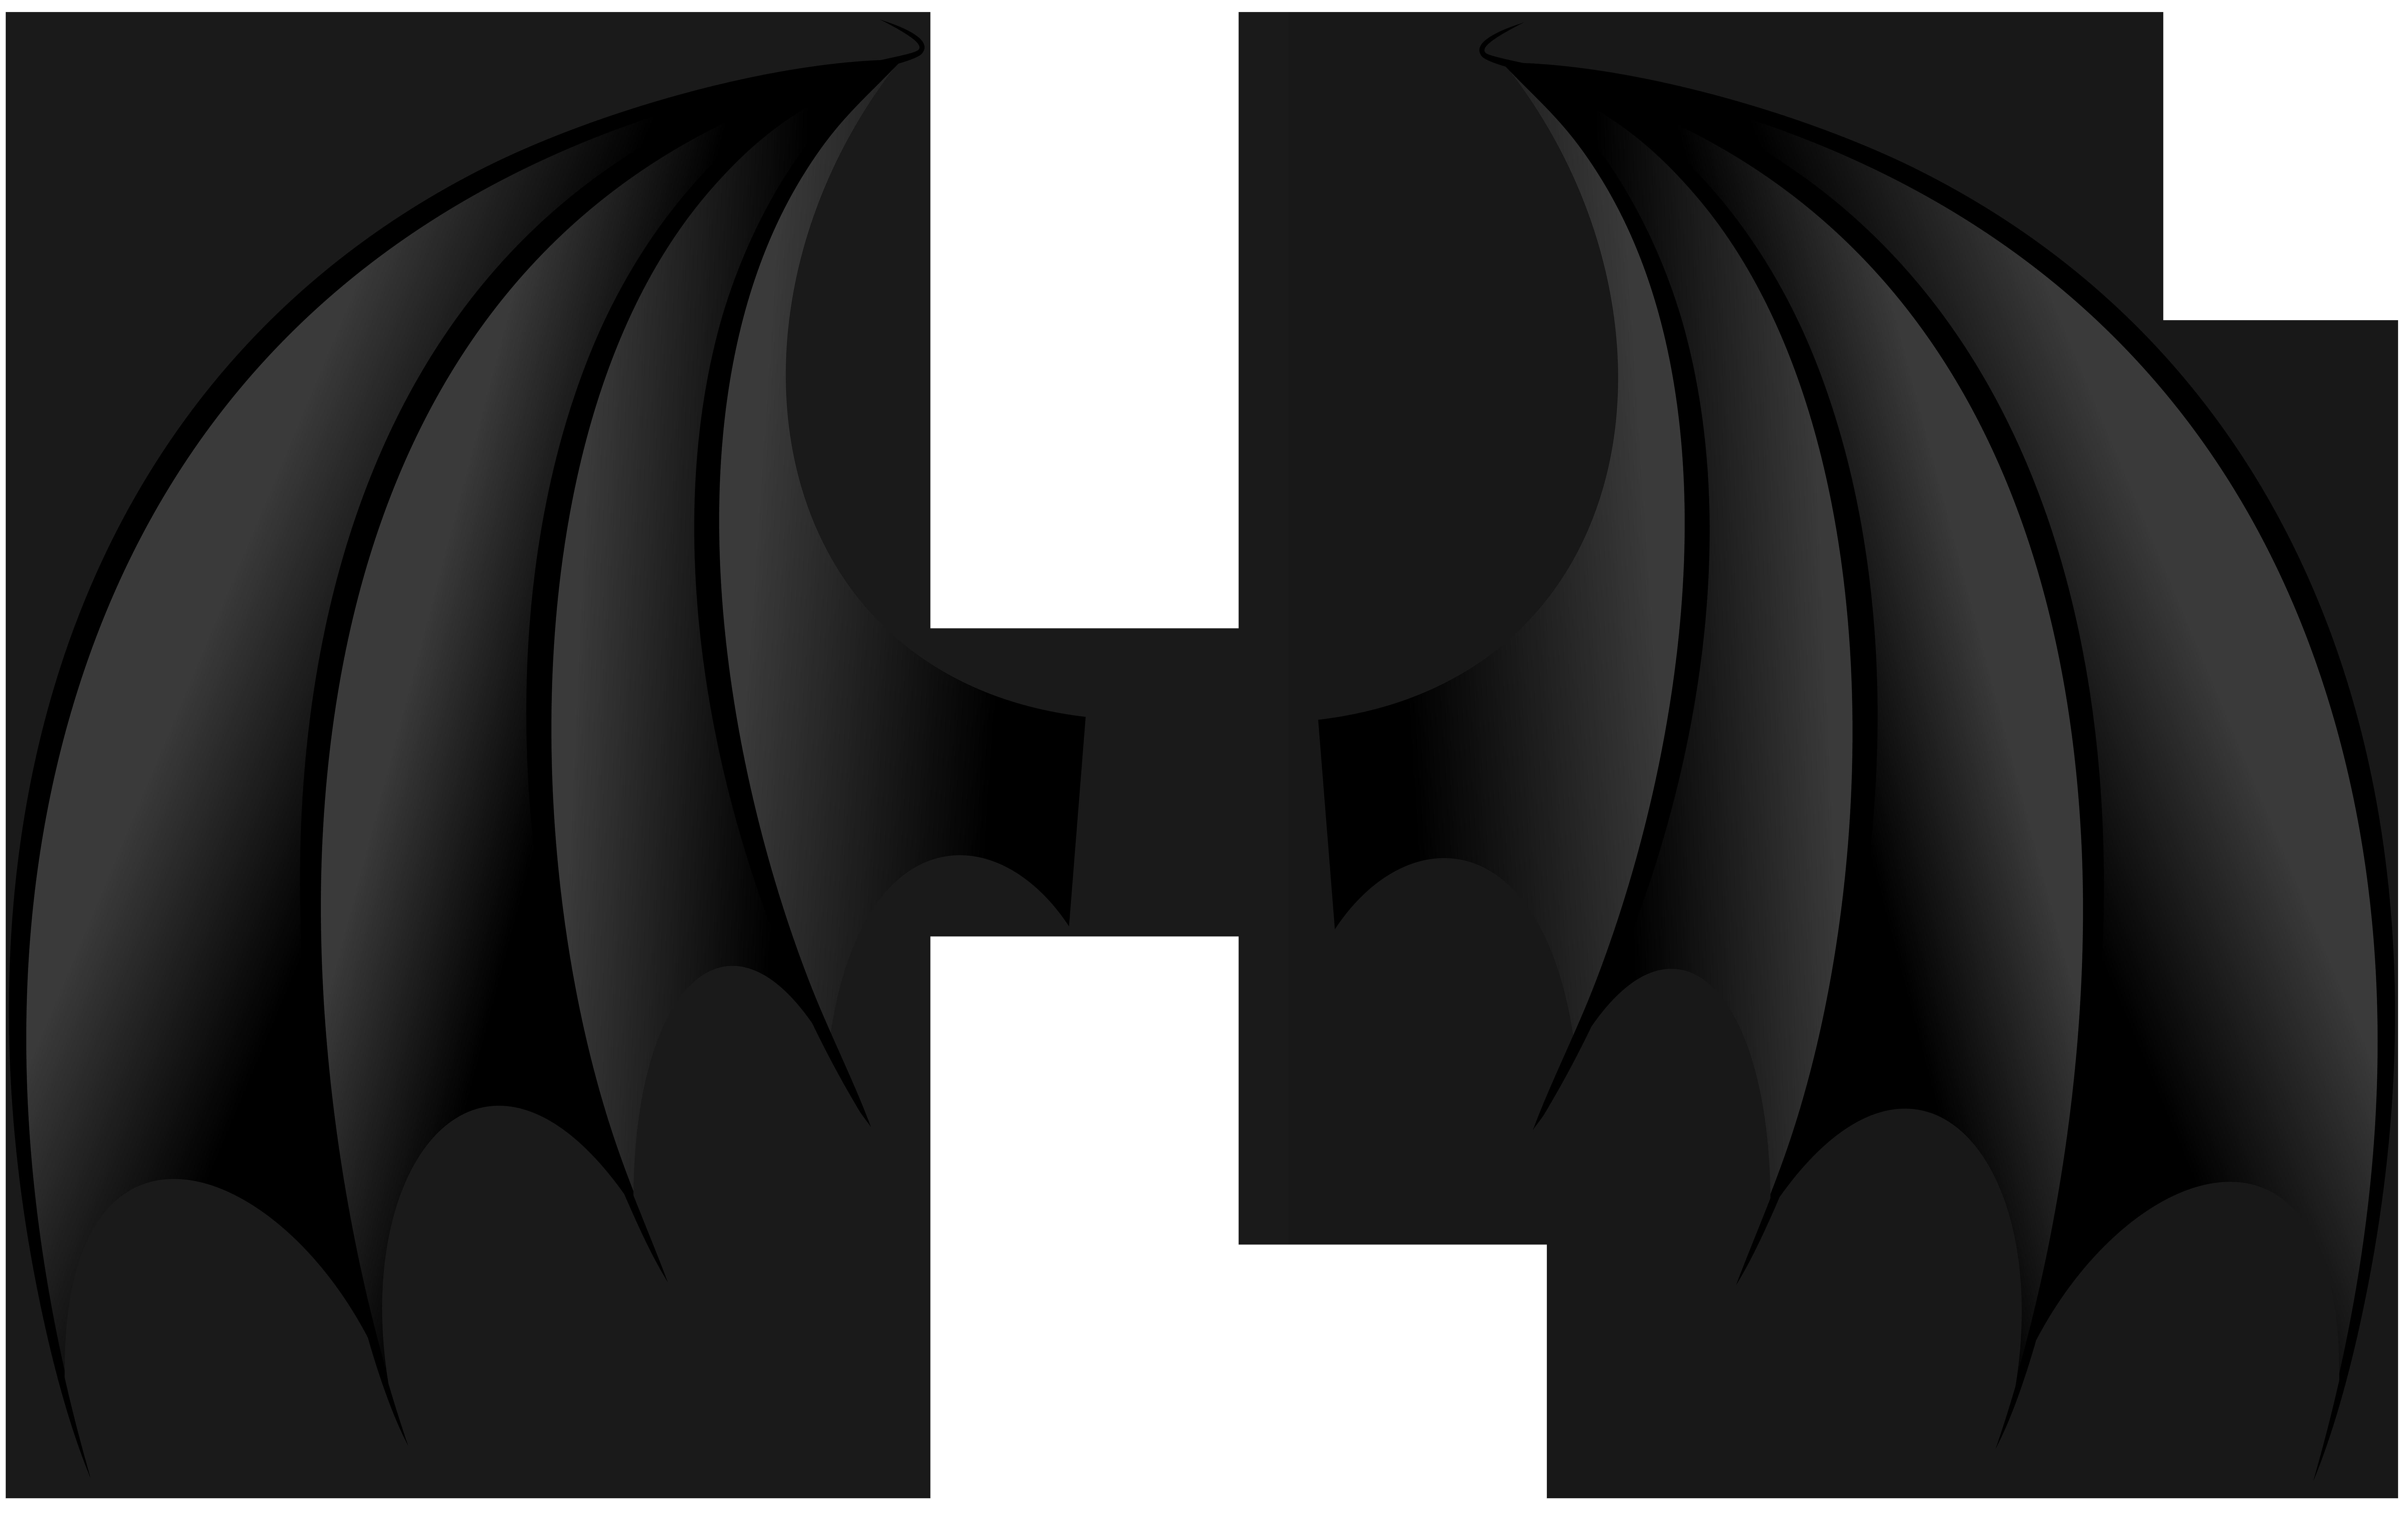 Png clip art image. Demon clipart wings